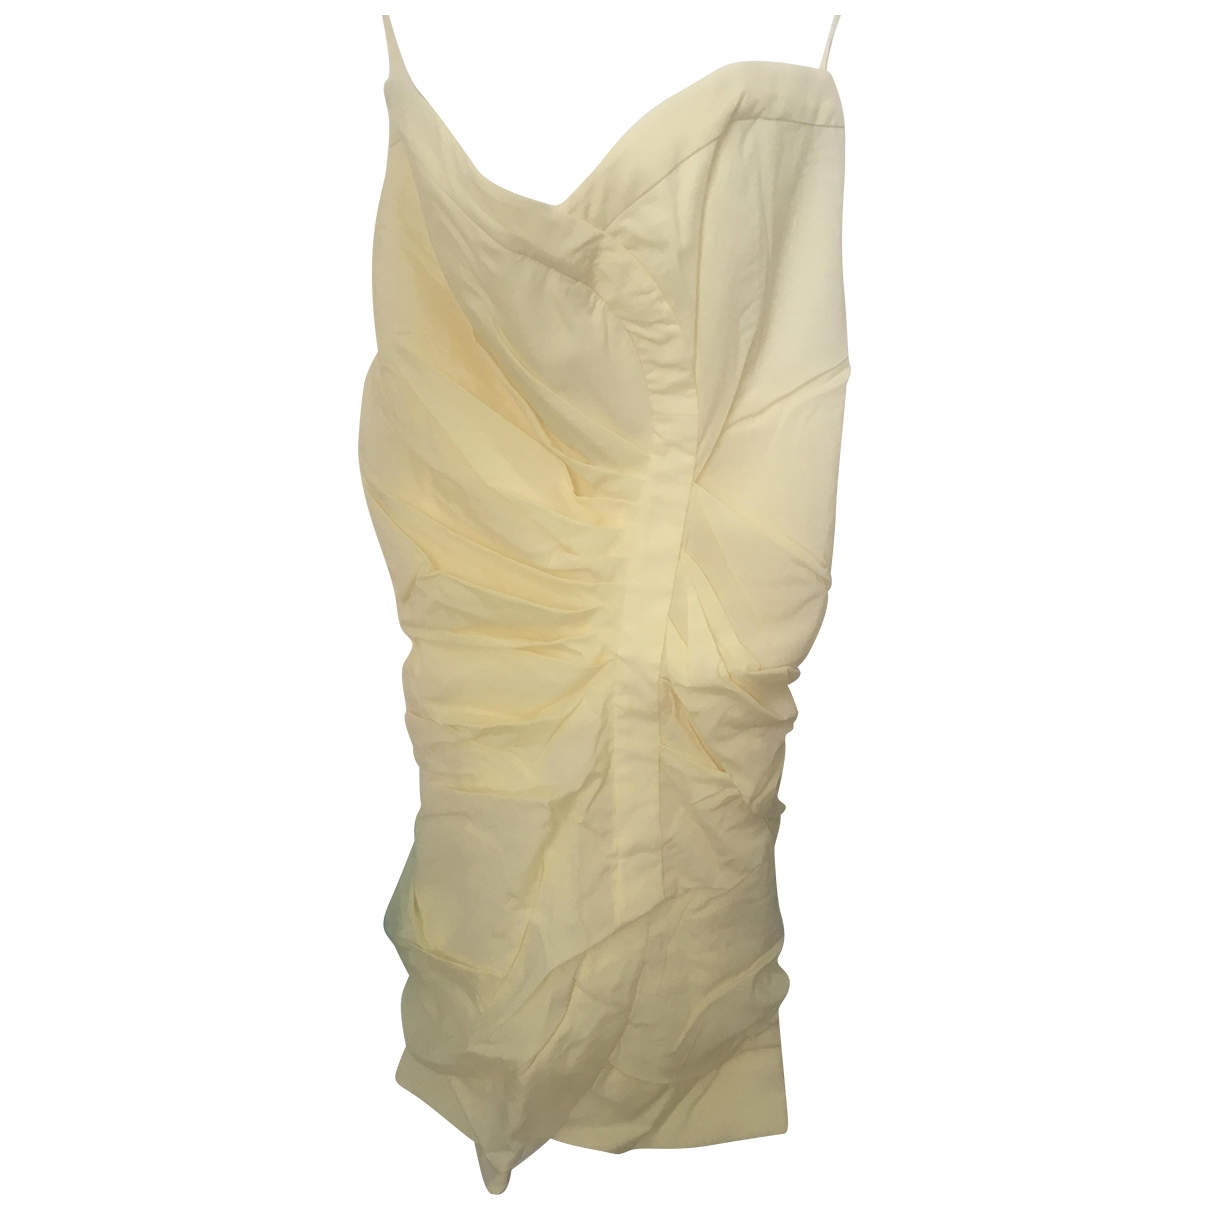 Alice & Olivia - Robe   pour femme en soie - jaune